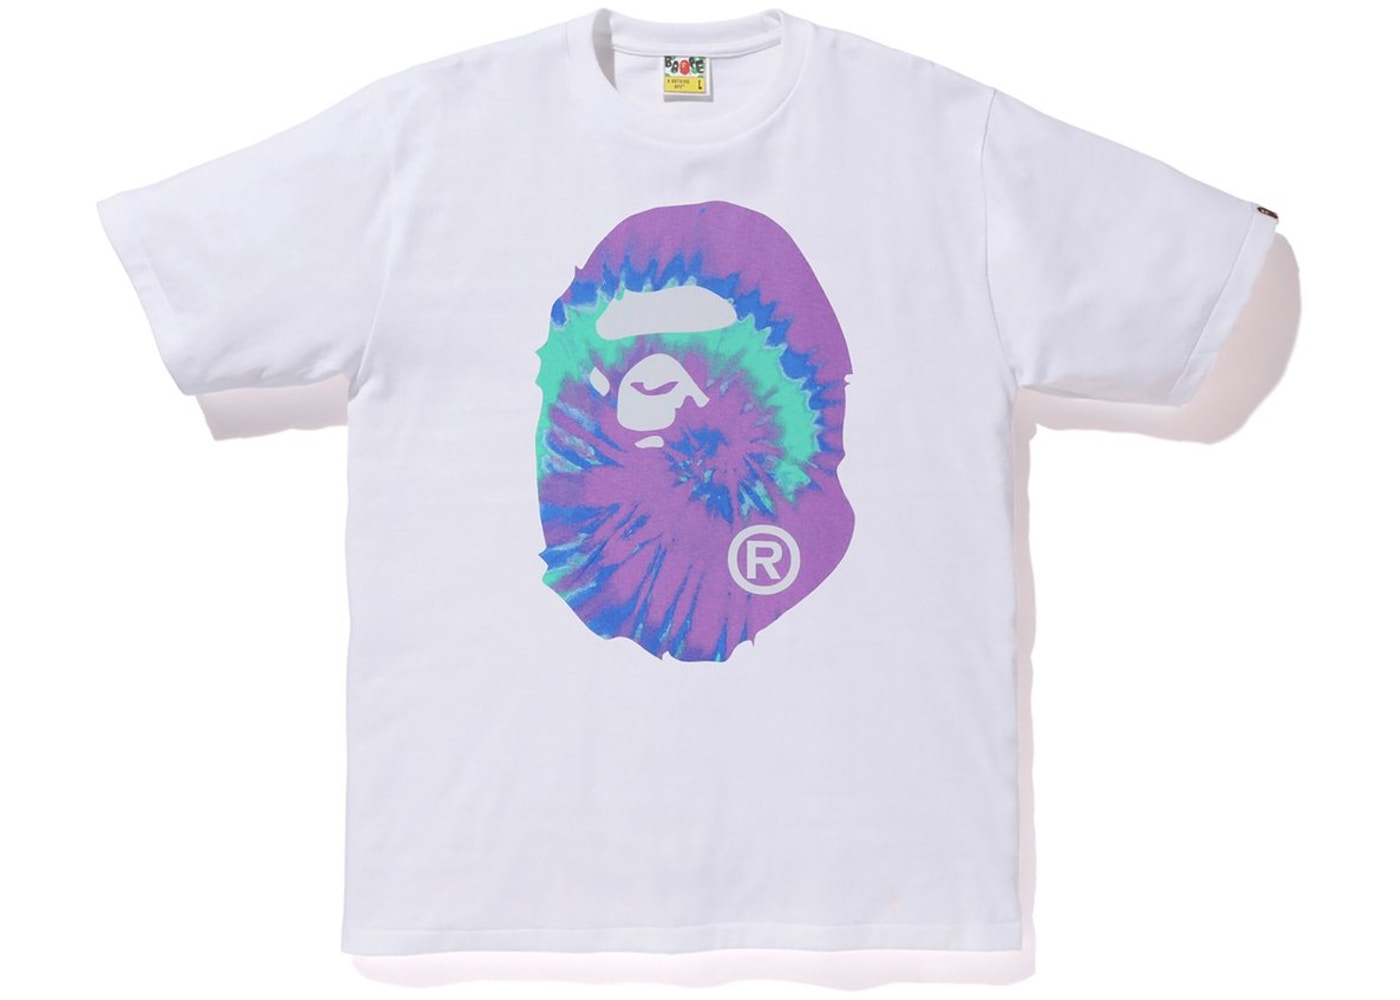 f117bce6 BAPE Pigment Tie Dye Big Ape Head Tee White/Purple - SS19